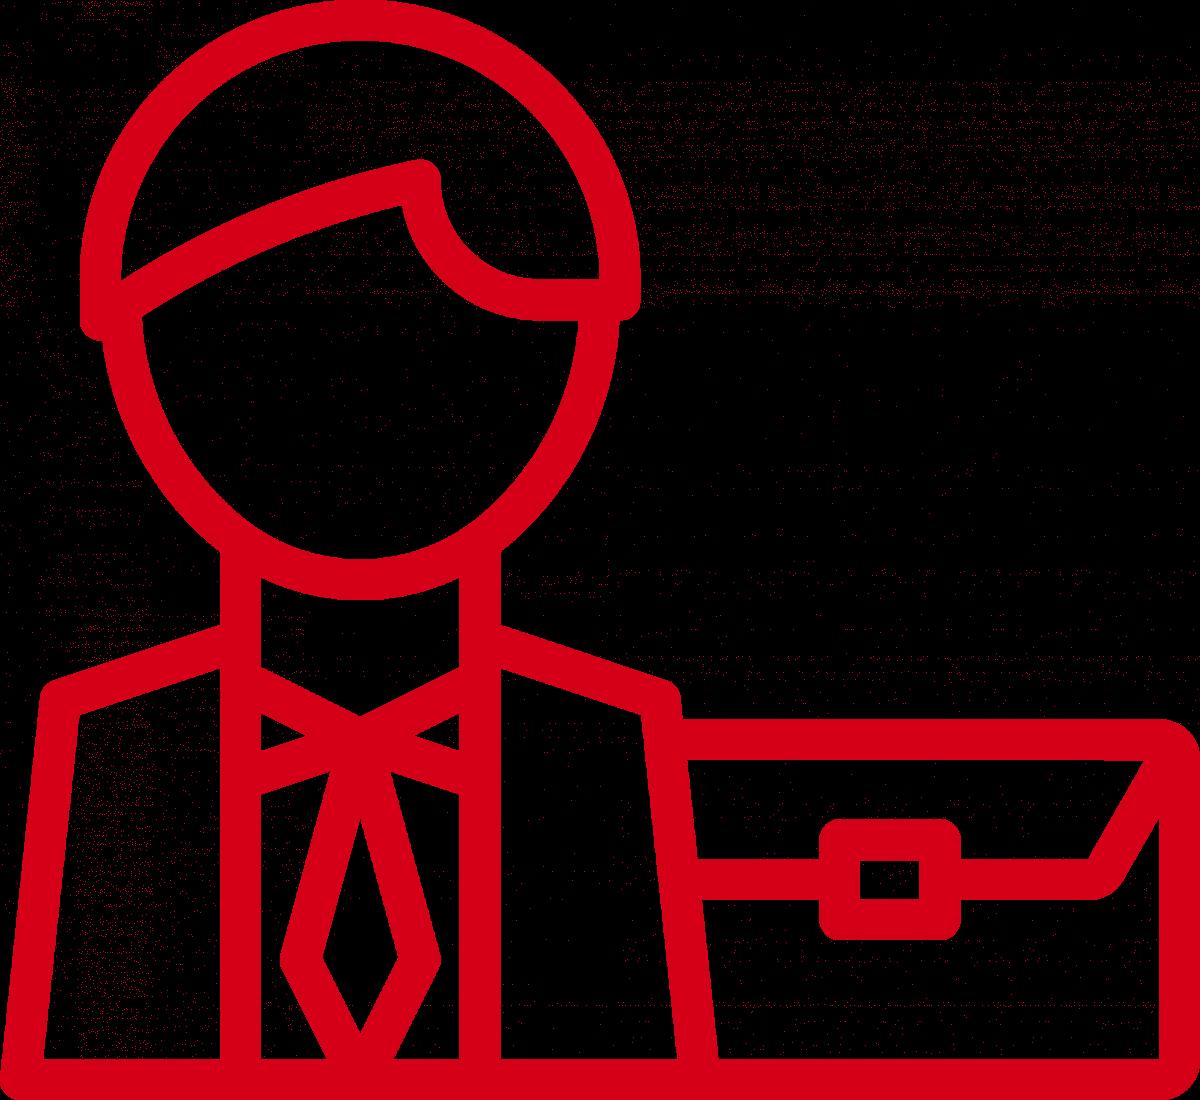 ESG Immobilier : contact alternance